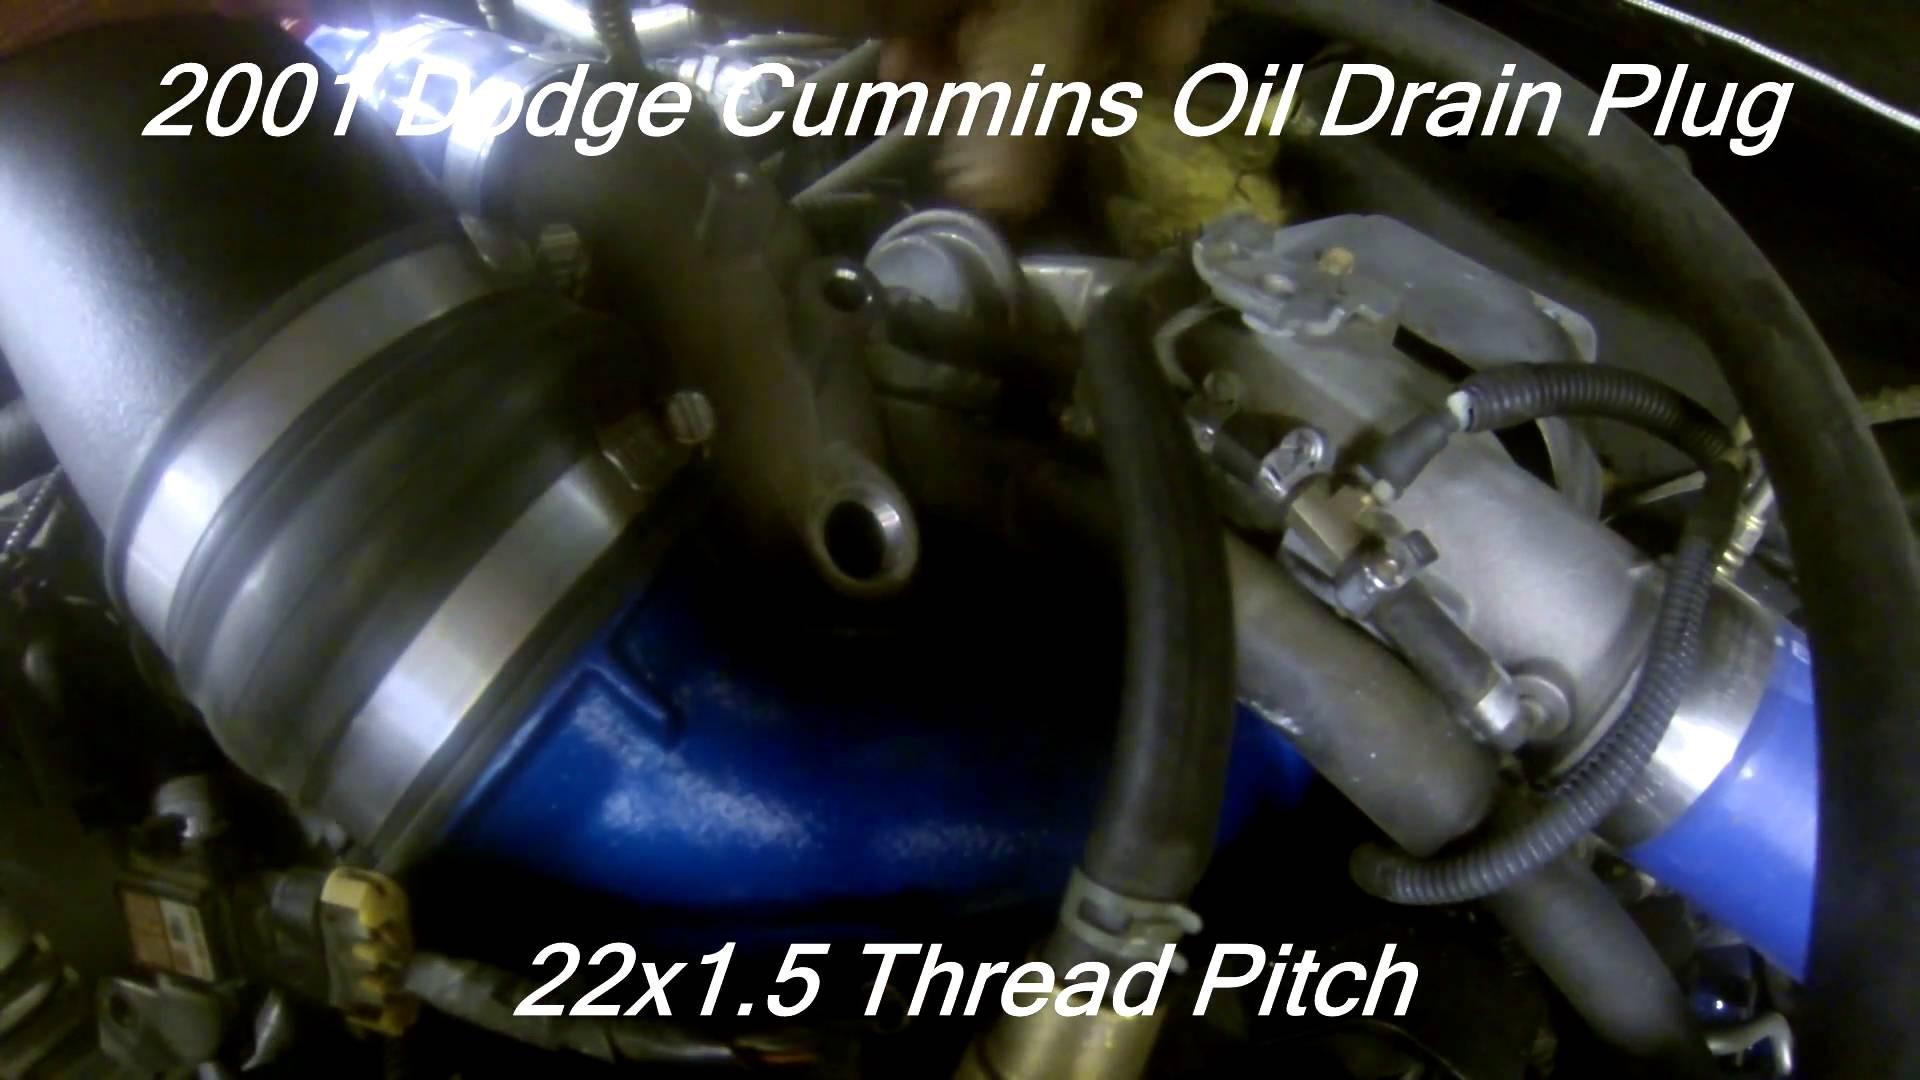 Lb7 Duramax Engine Diagram Lb7 Duramax Intake Heater Delete Of Lb7 Duramax Engine Diagram